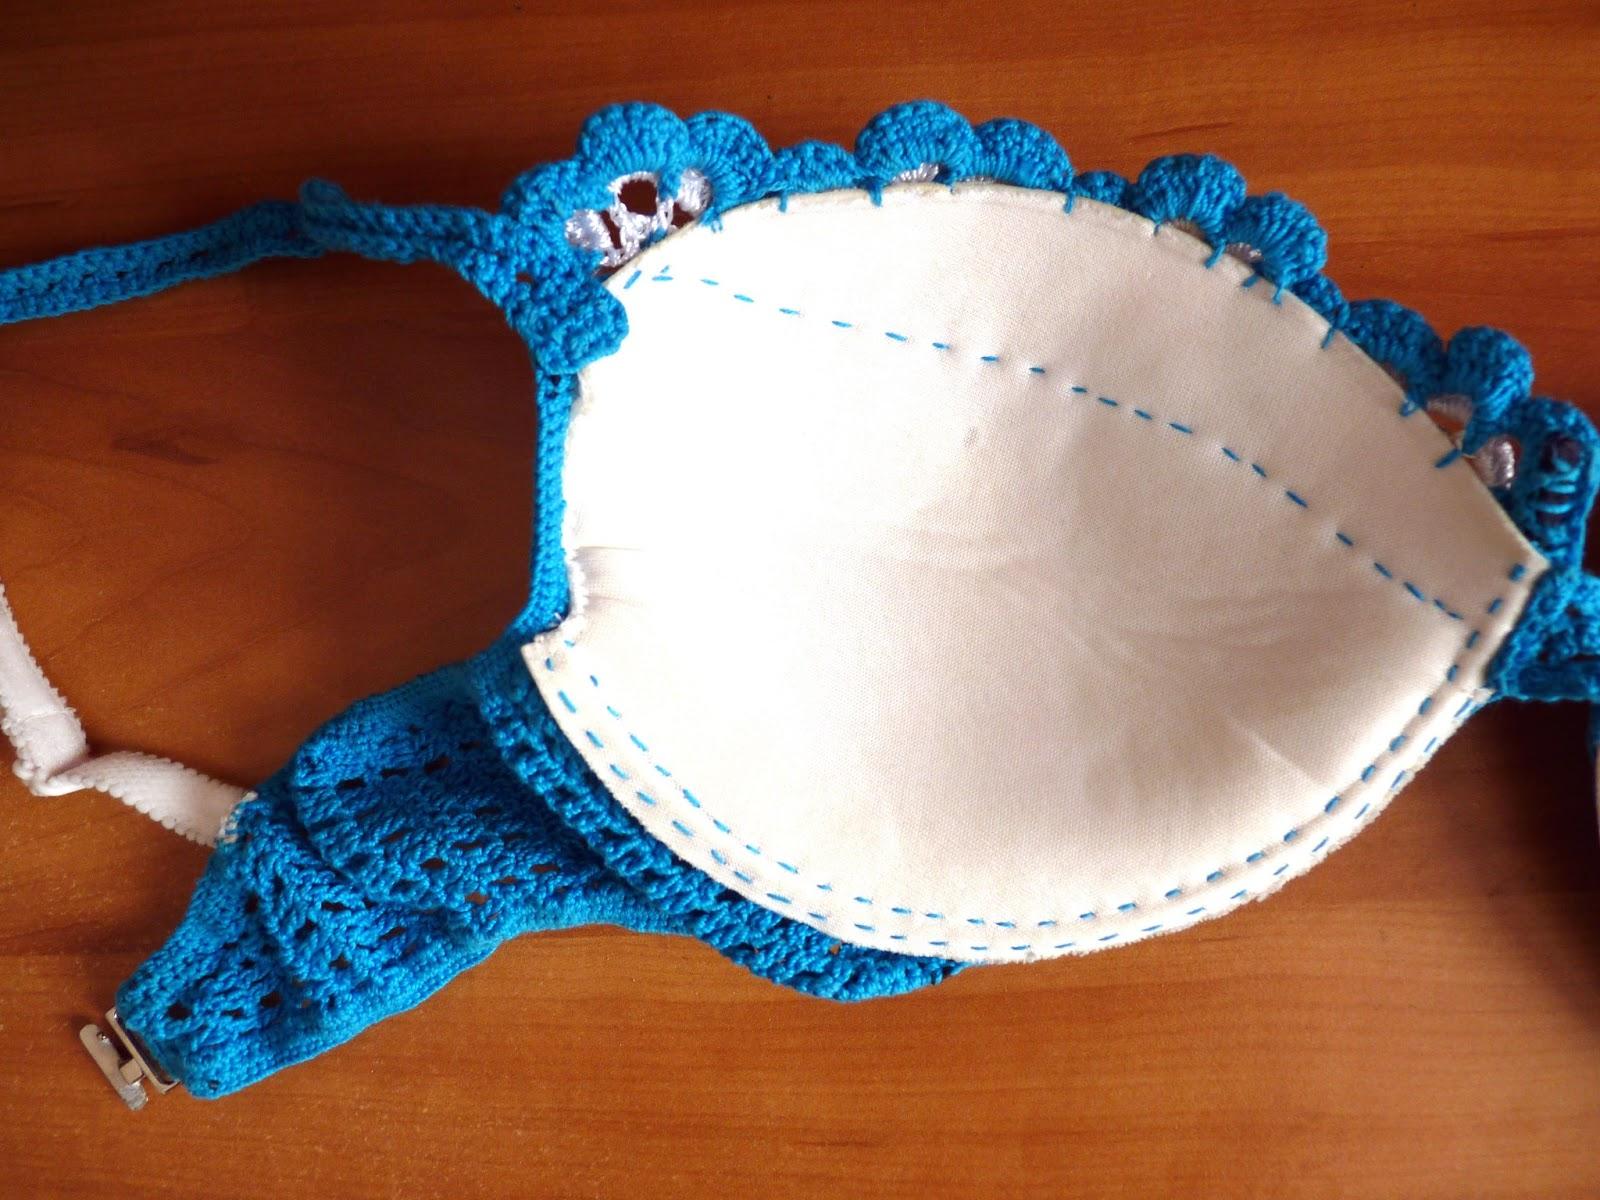 Como hacer biquini a crochet paso a paso patrones - Como hacer cosas de ganchillo ...